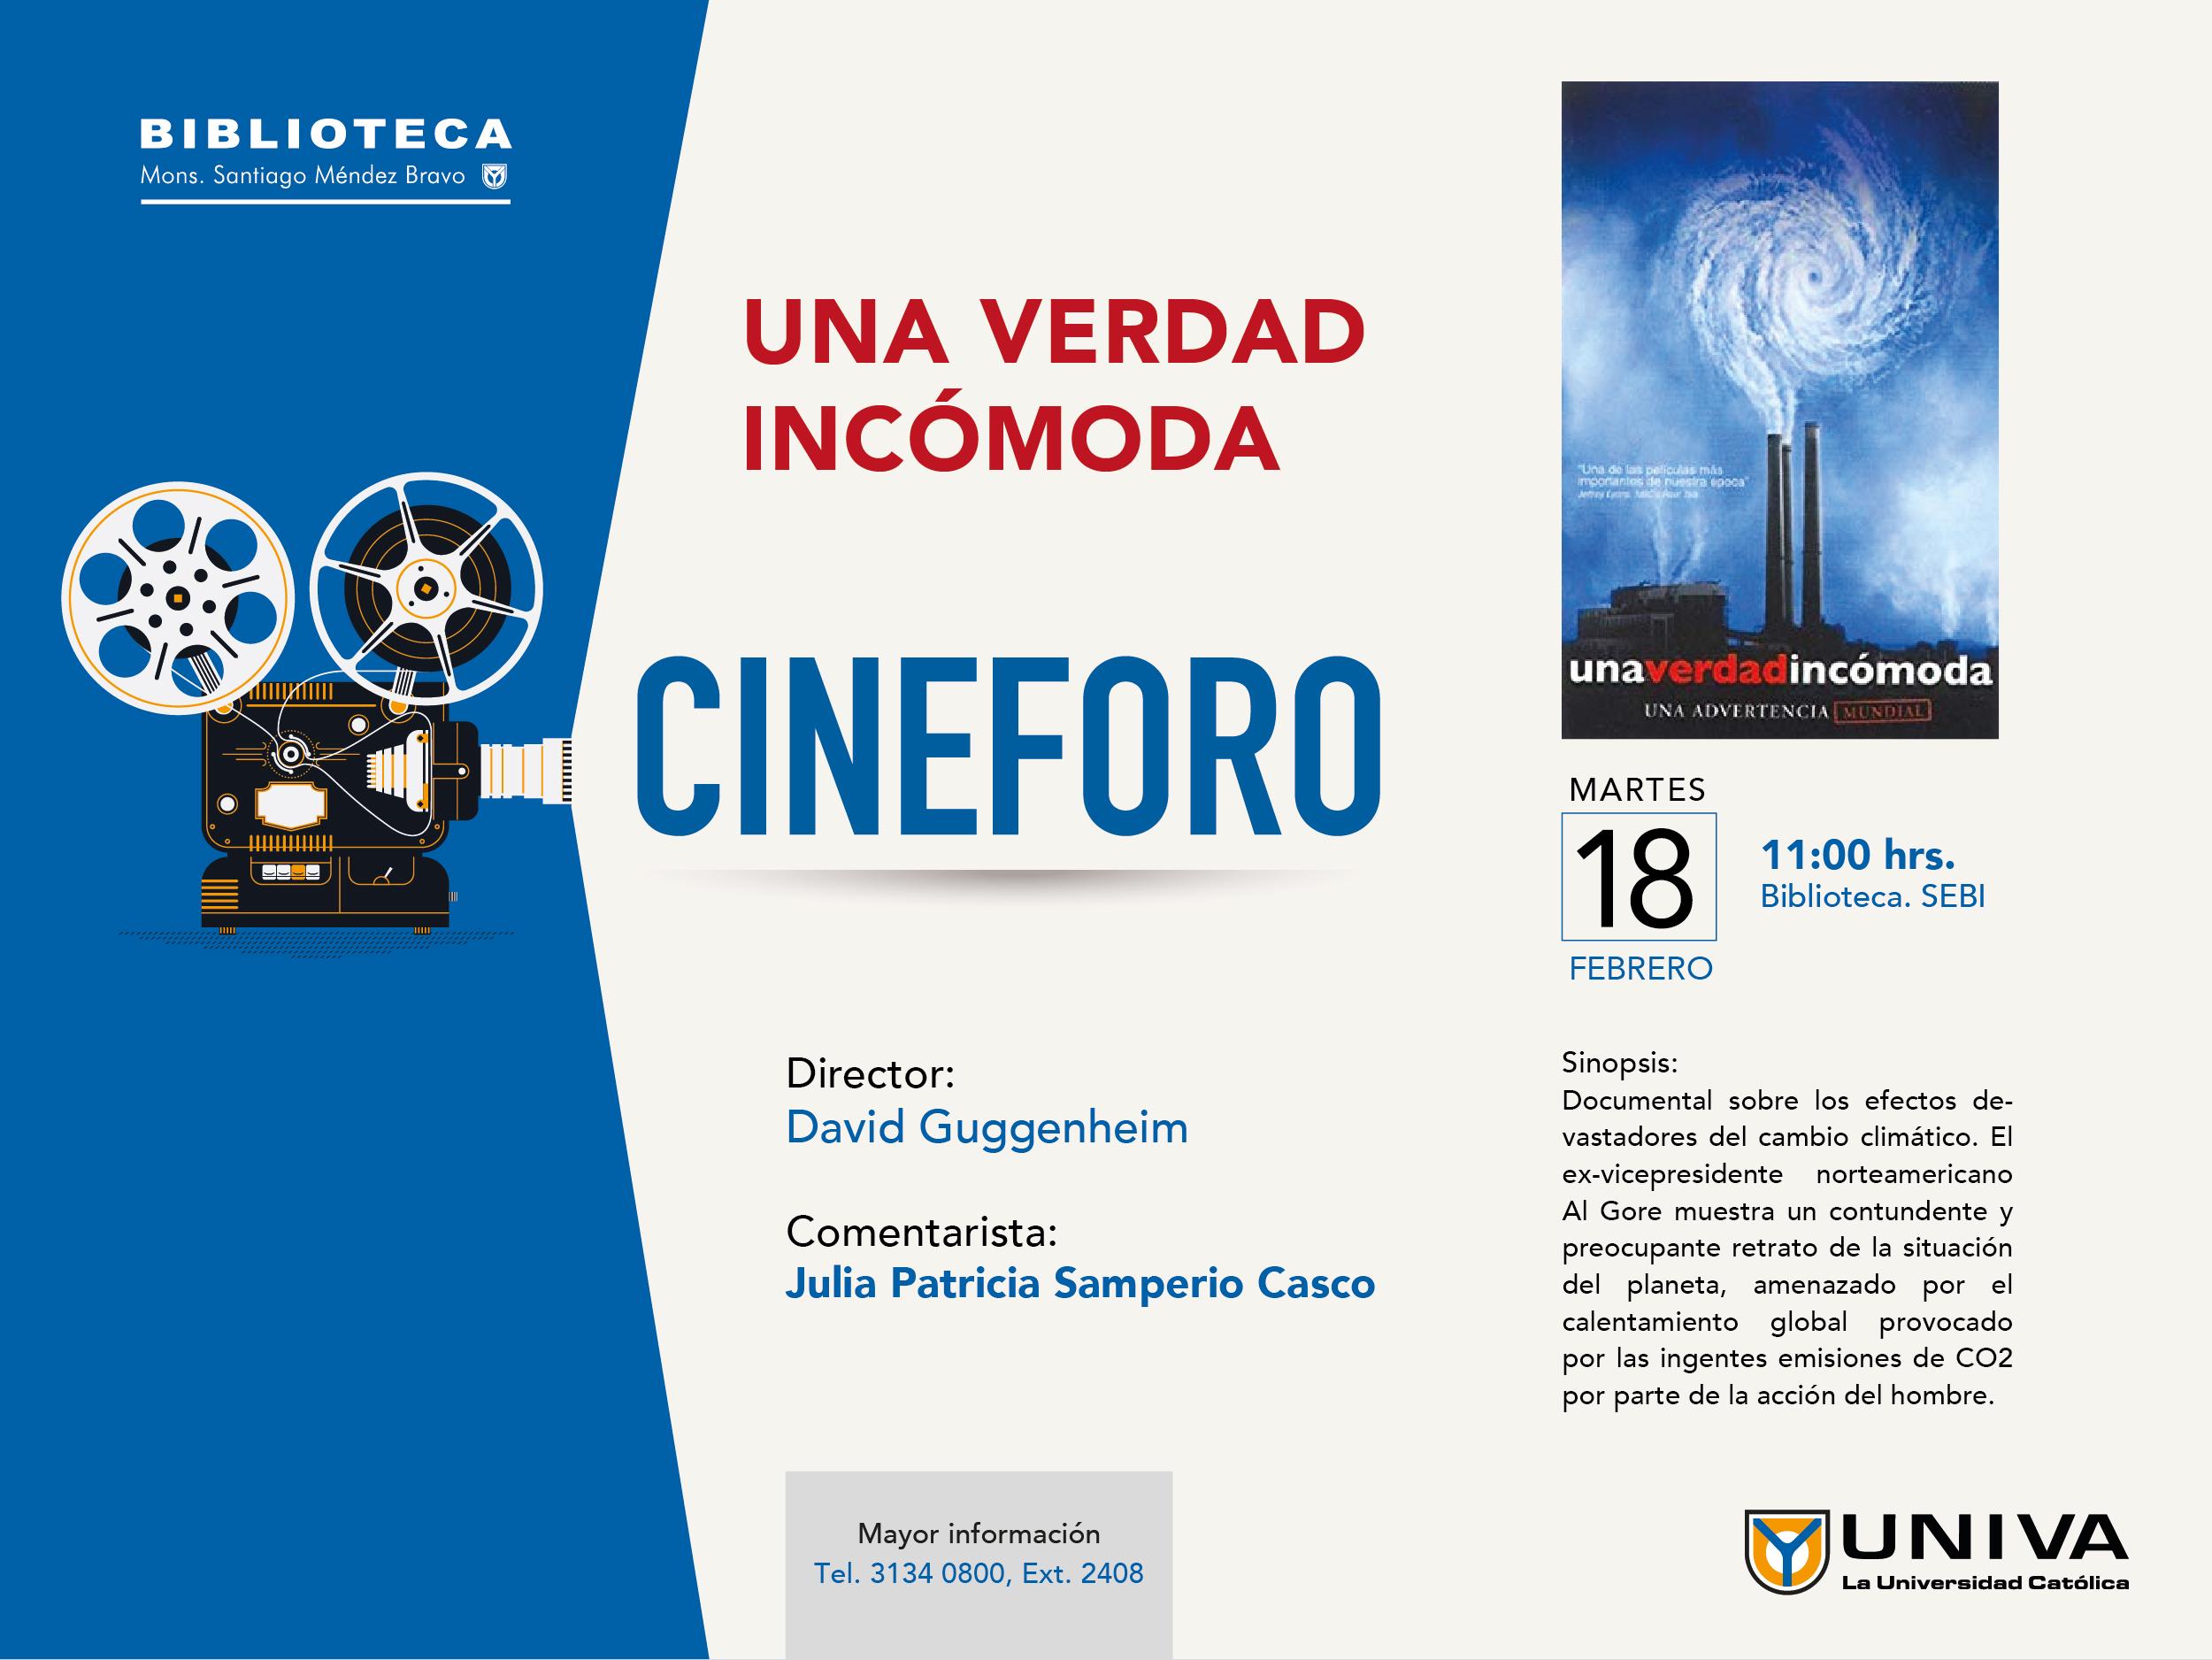 Cineforo UNIVA: Una Verdad Incómoda